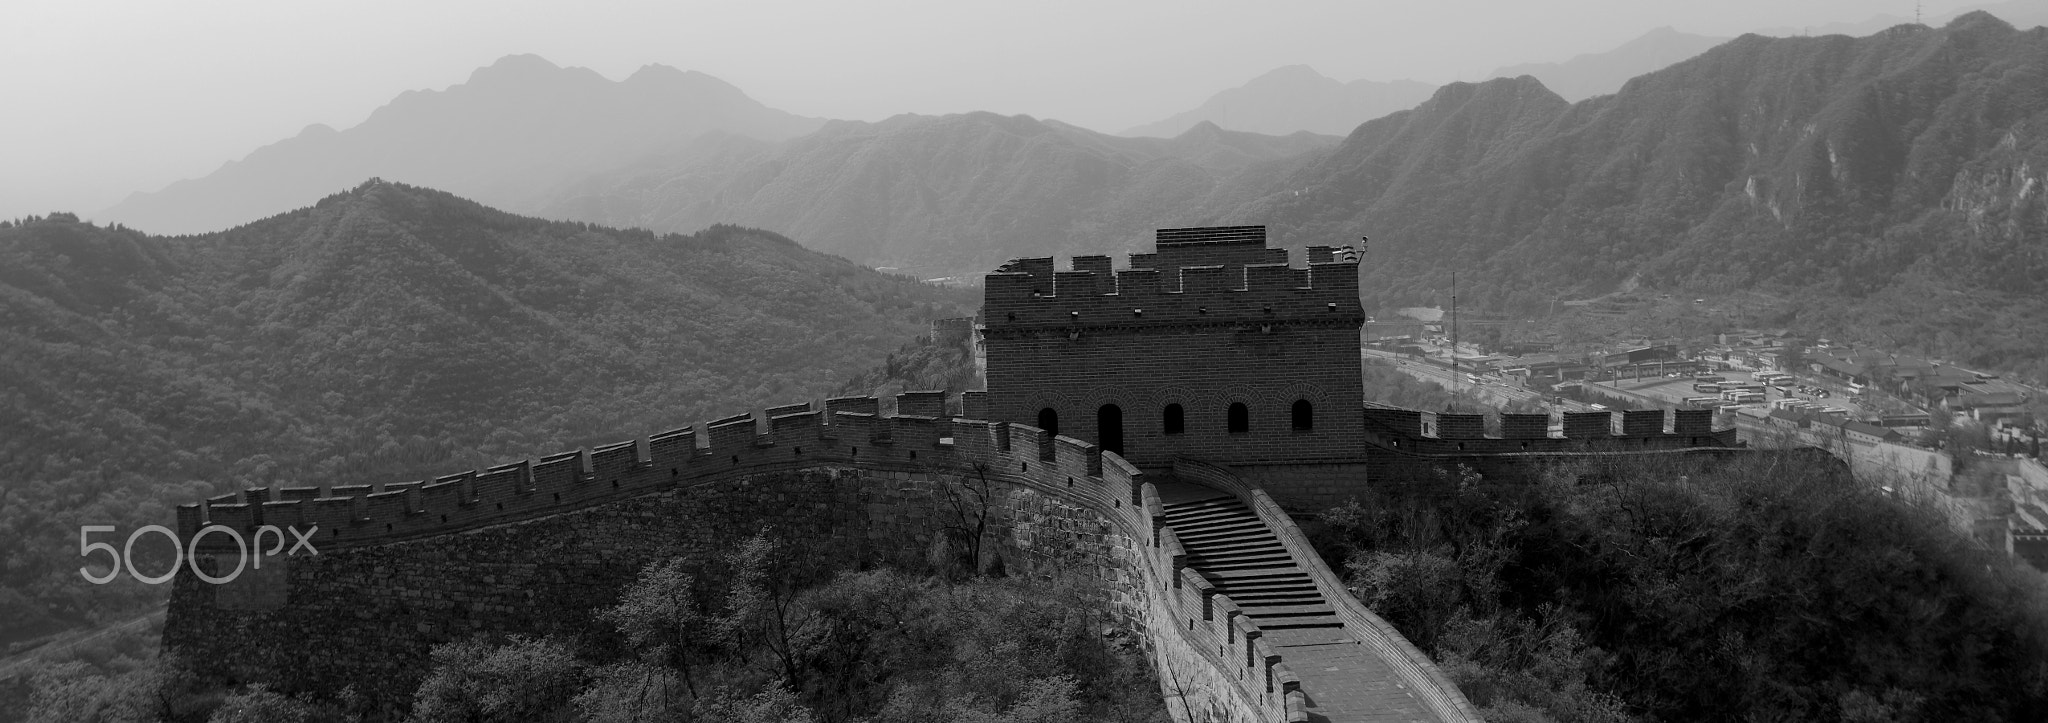 The Juyongguan pass section of the Great Wall of China, Changpin